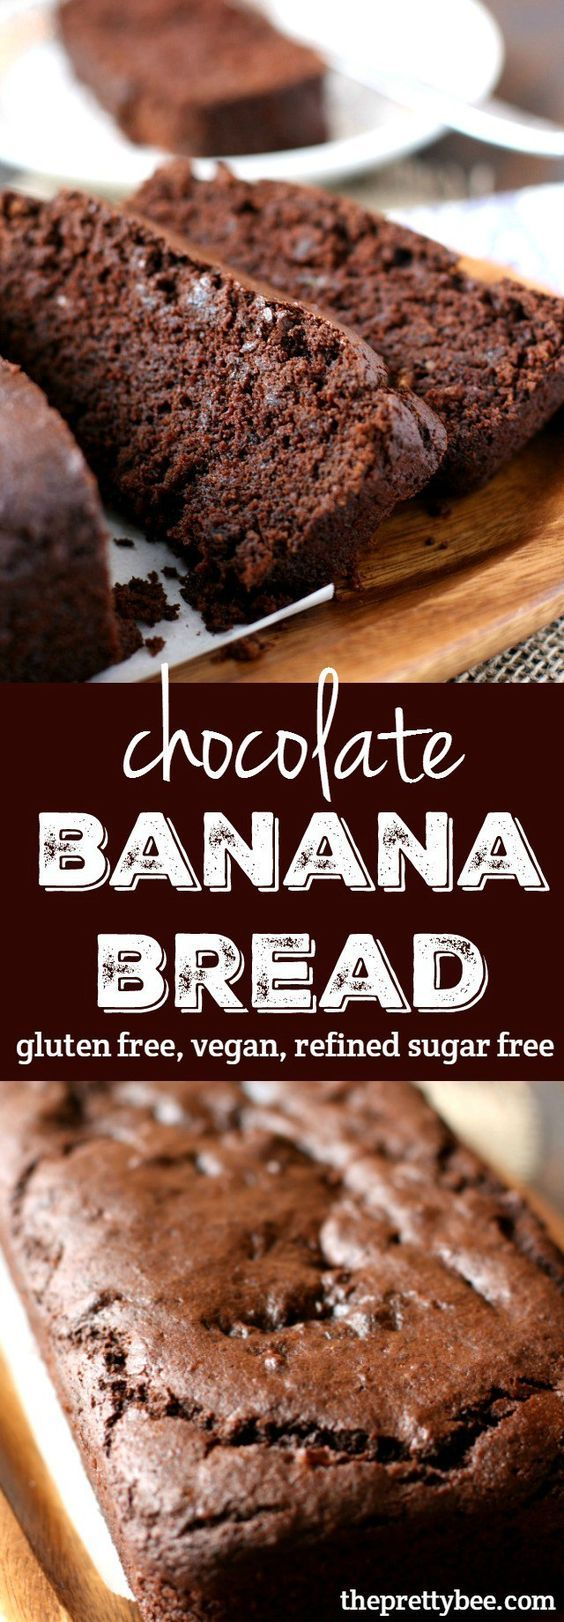 Chocolate Banana Bread (Gluten Free Vegan Refined Sugar Free).